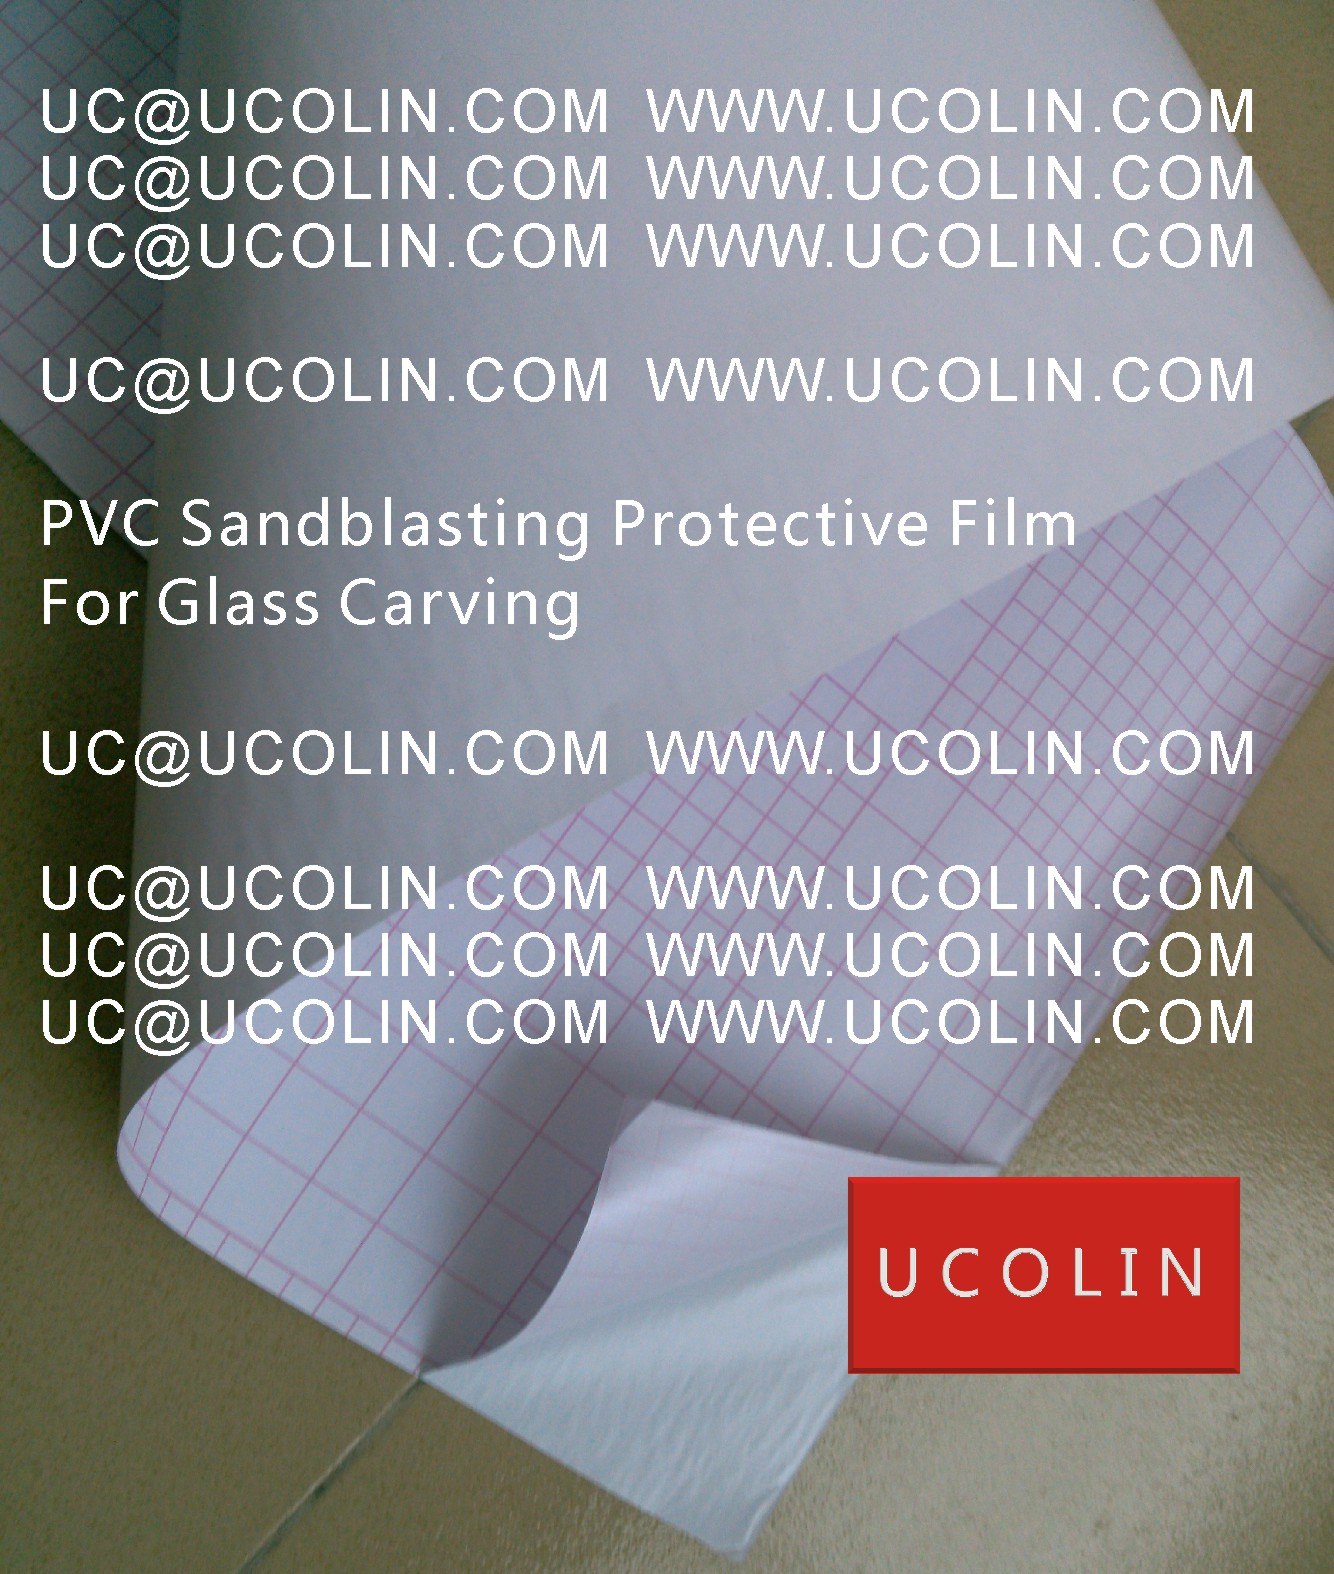 005 PVC Sandblasting Protective Film For Glass Carving